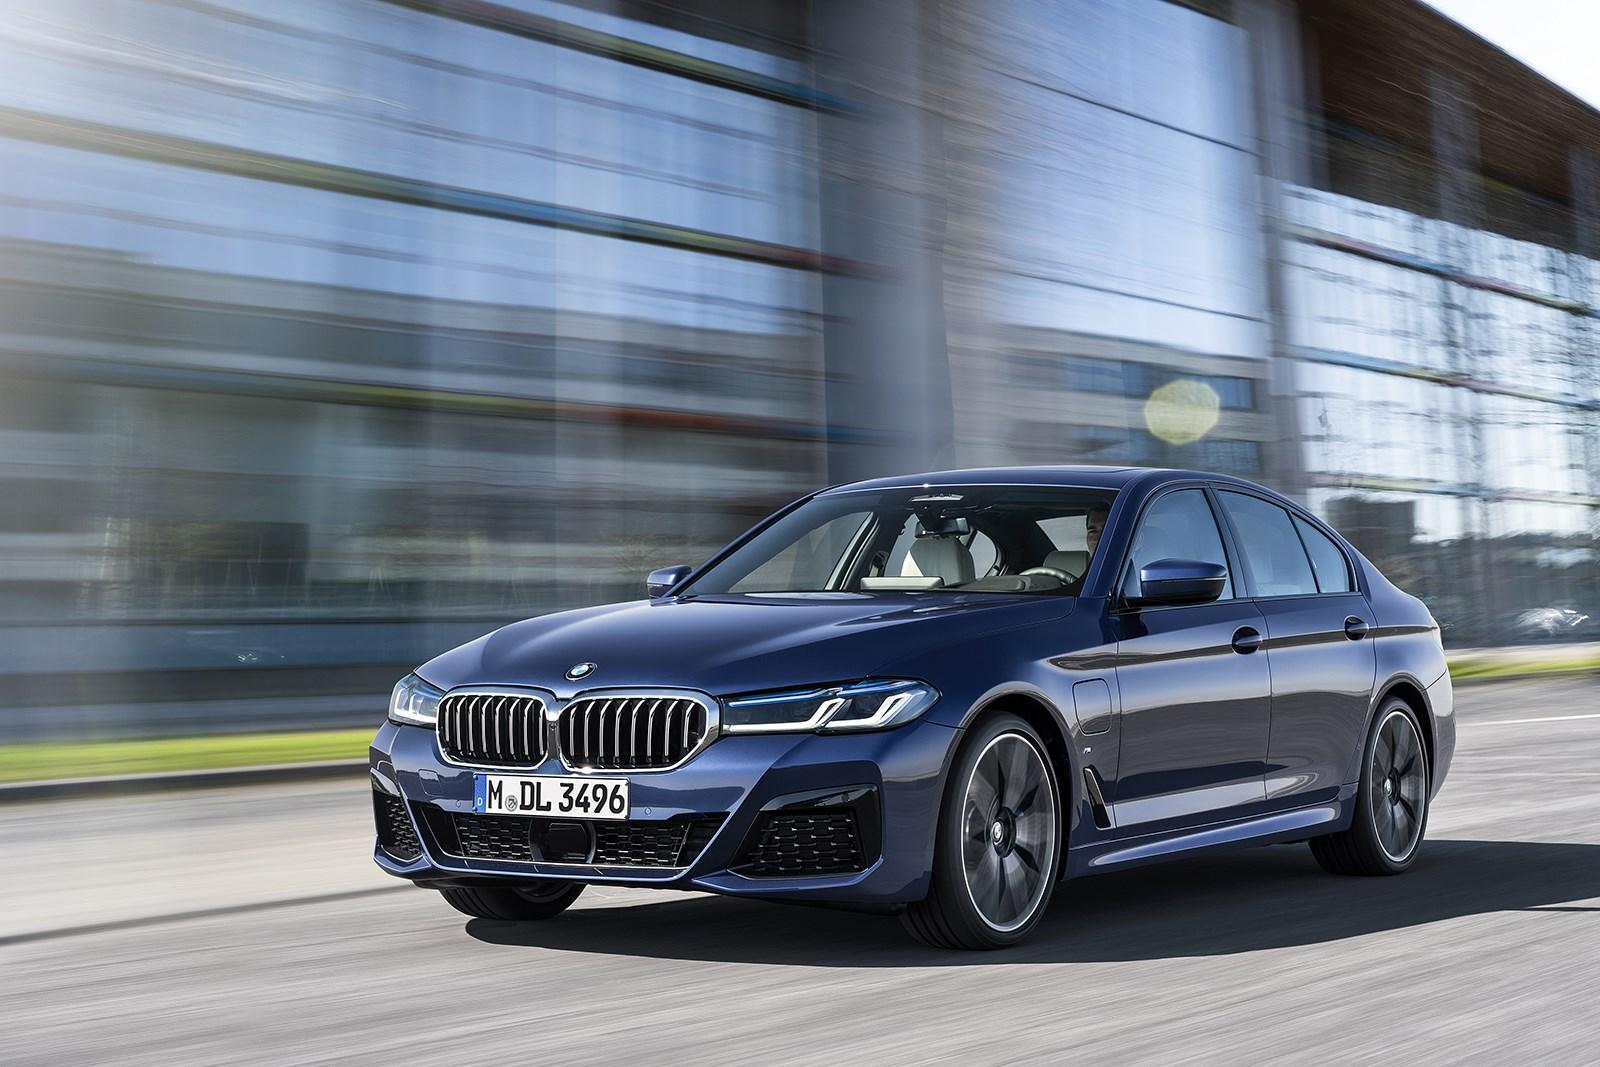 BMW5シリーズが本国でマイナーチェンジ 外装の変更&装備が進化